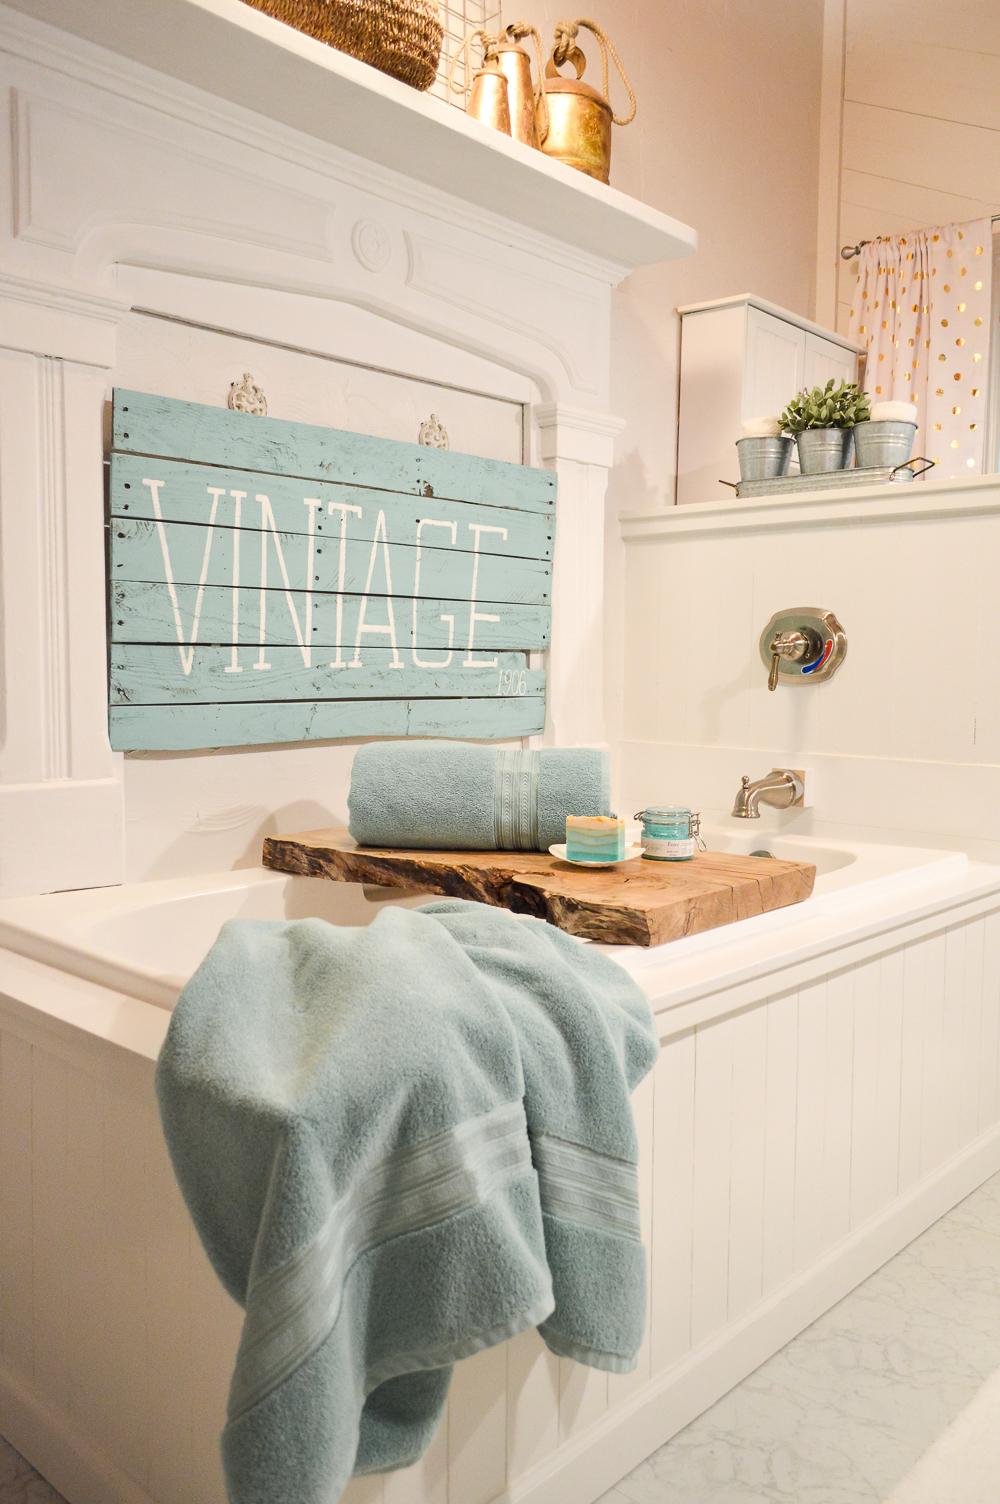 Aqua Summer Bathroom Refresh | Cottage bath, vintage mantel over shiplap wrapped soaker tub.